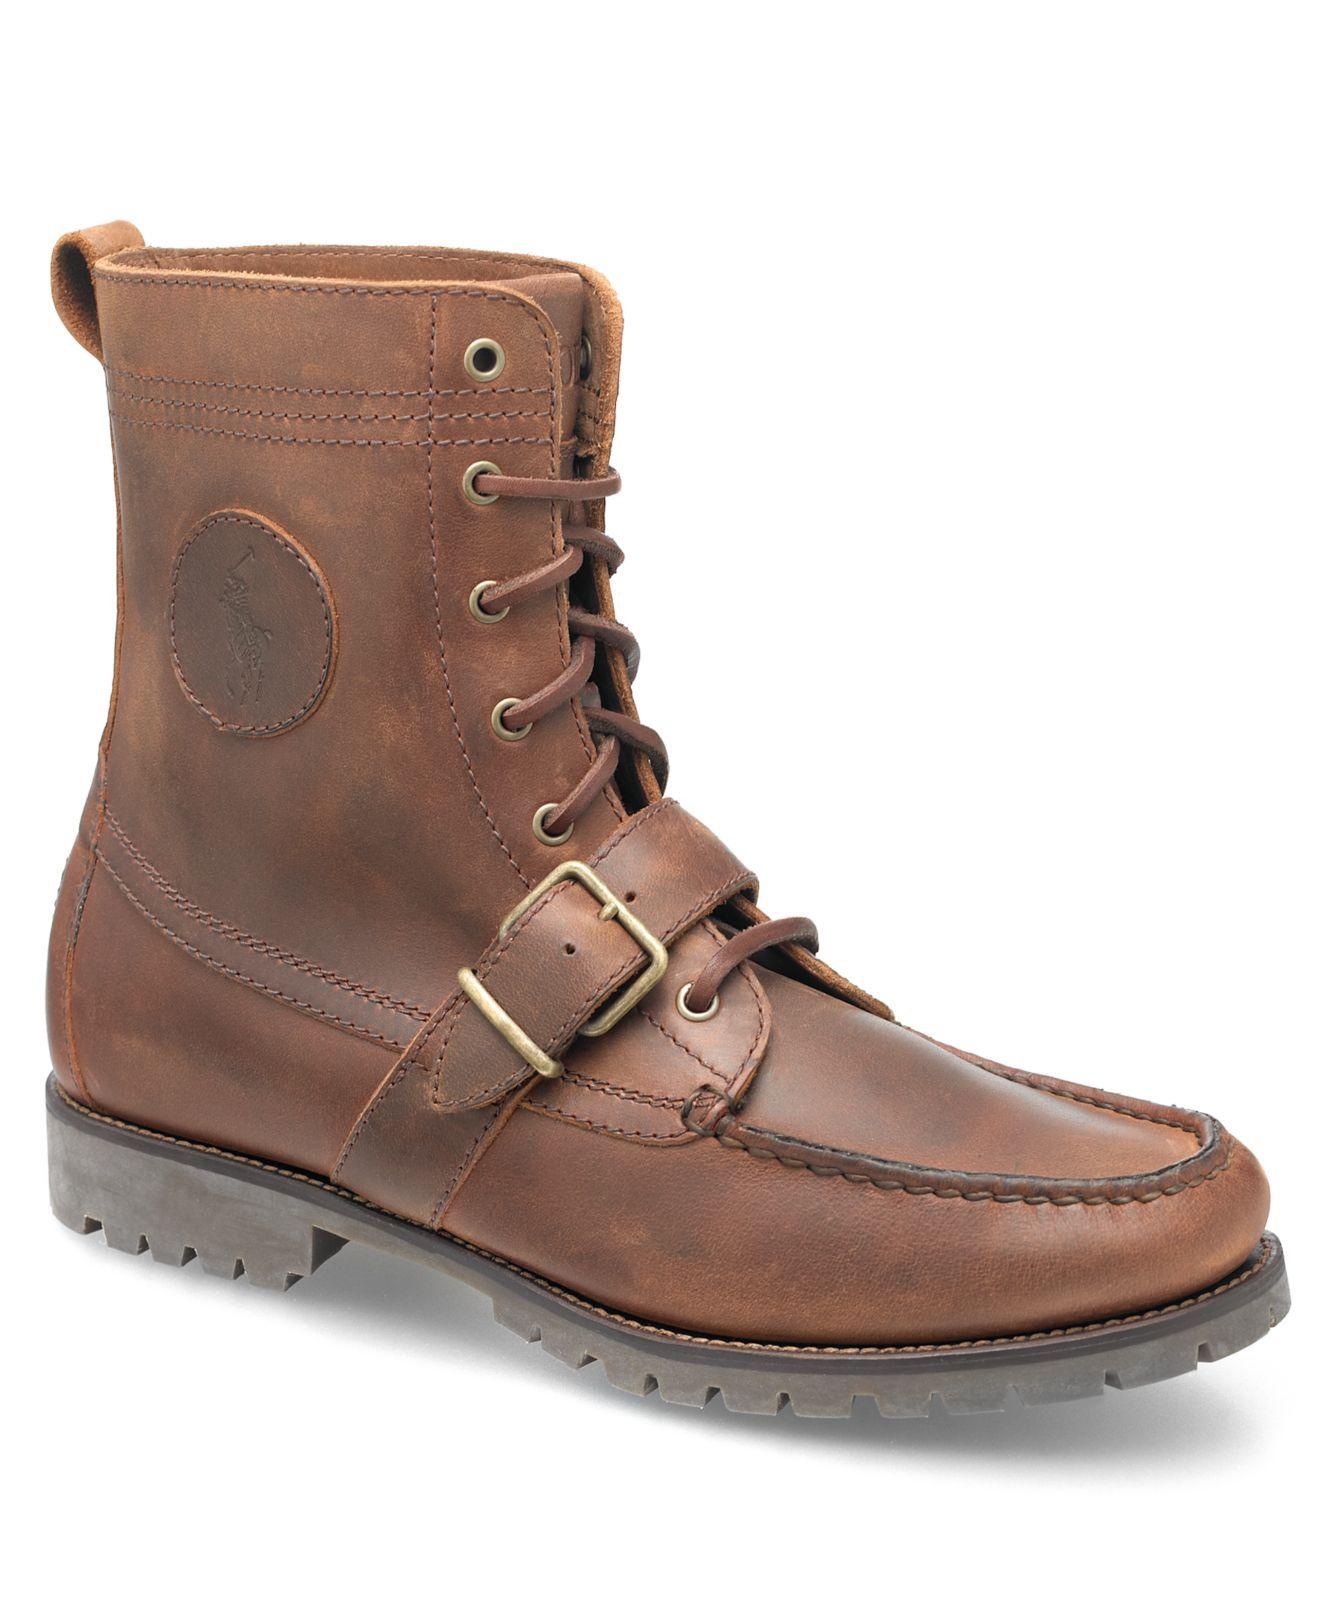 Polo Ralph Lauren Boots, Ranger Strap Boots - Mens Shoes - Macy\u0027s